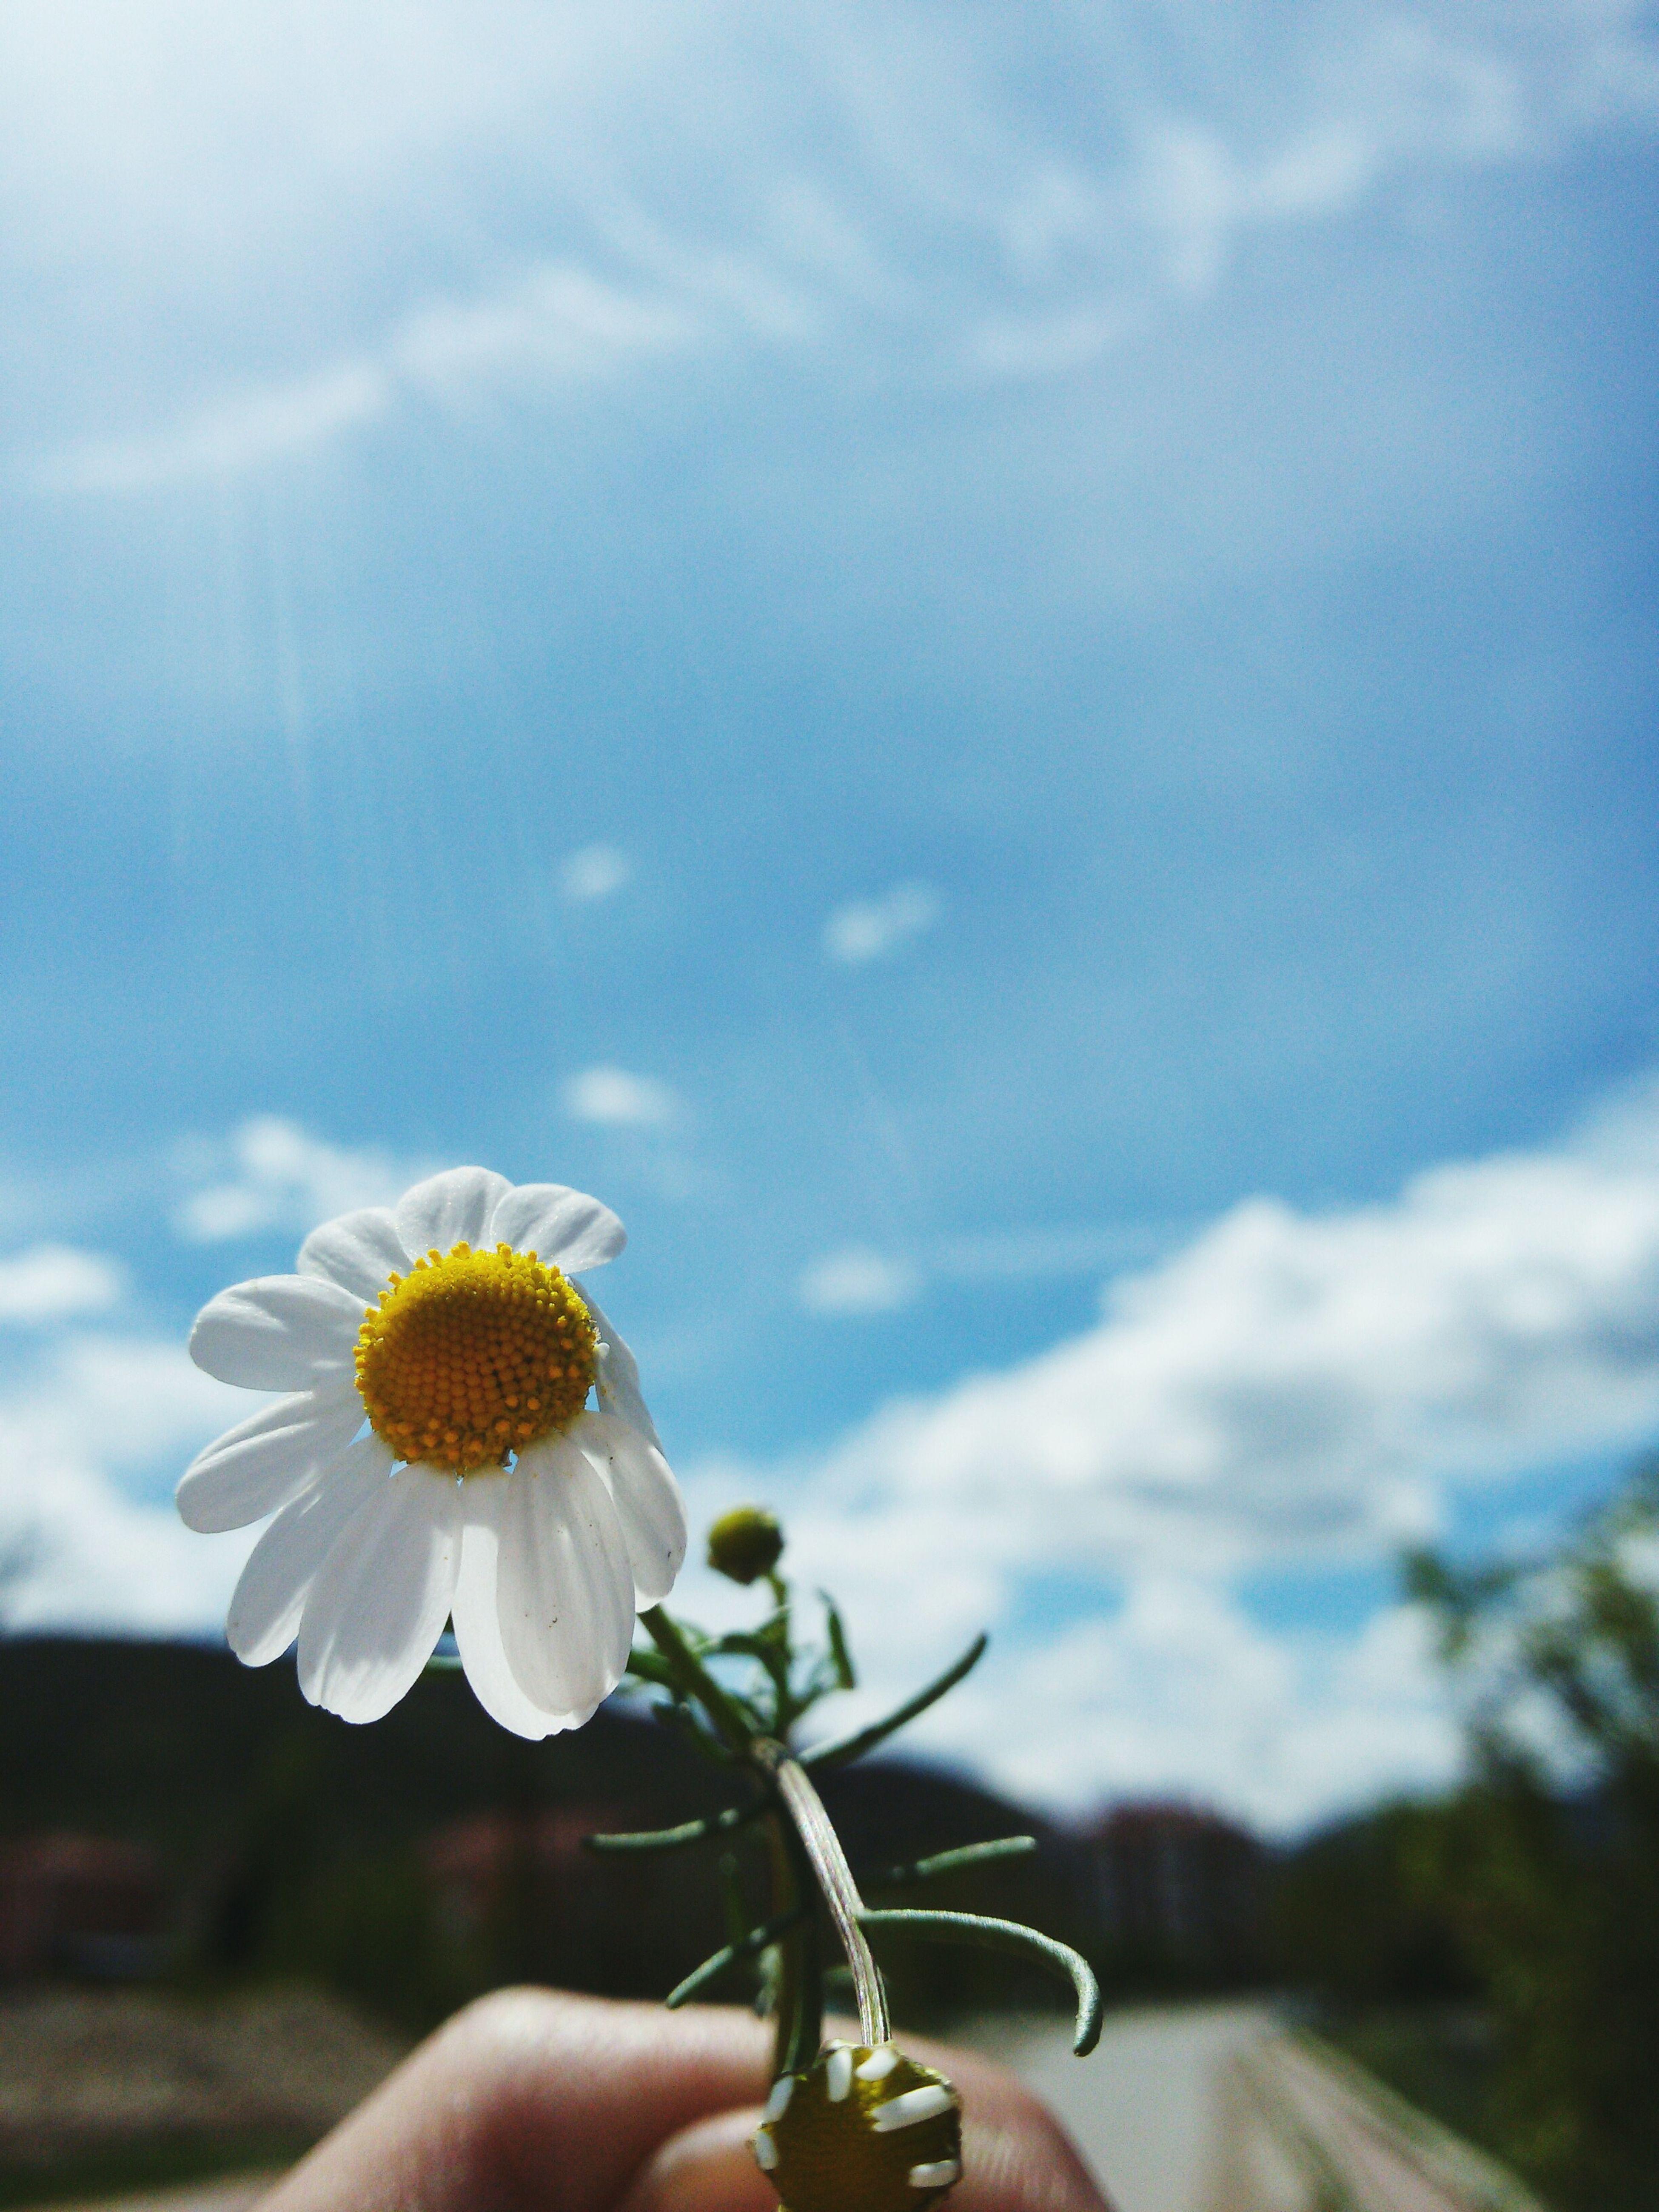 Sun Whatabeautifulday Sippin'on Sunshine! Papatya Gökyüzümavisi Ensevdigim